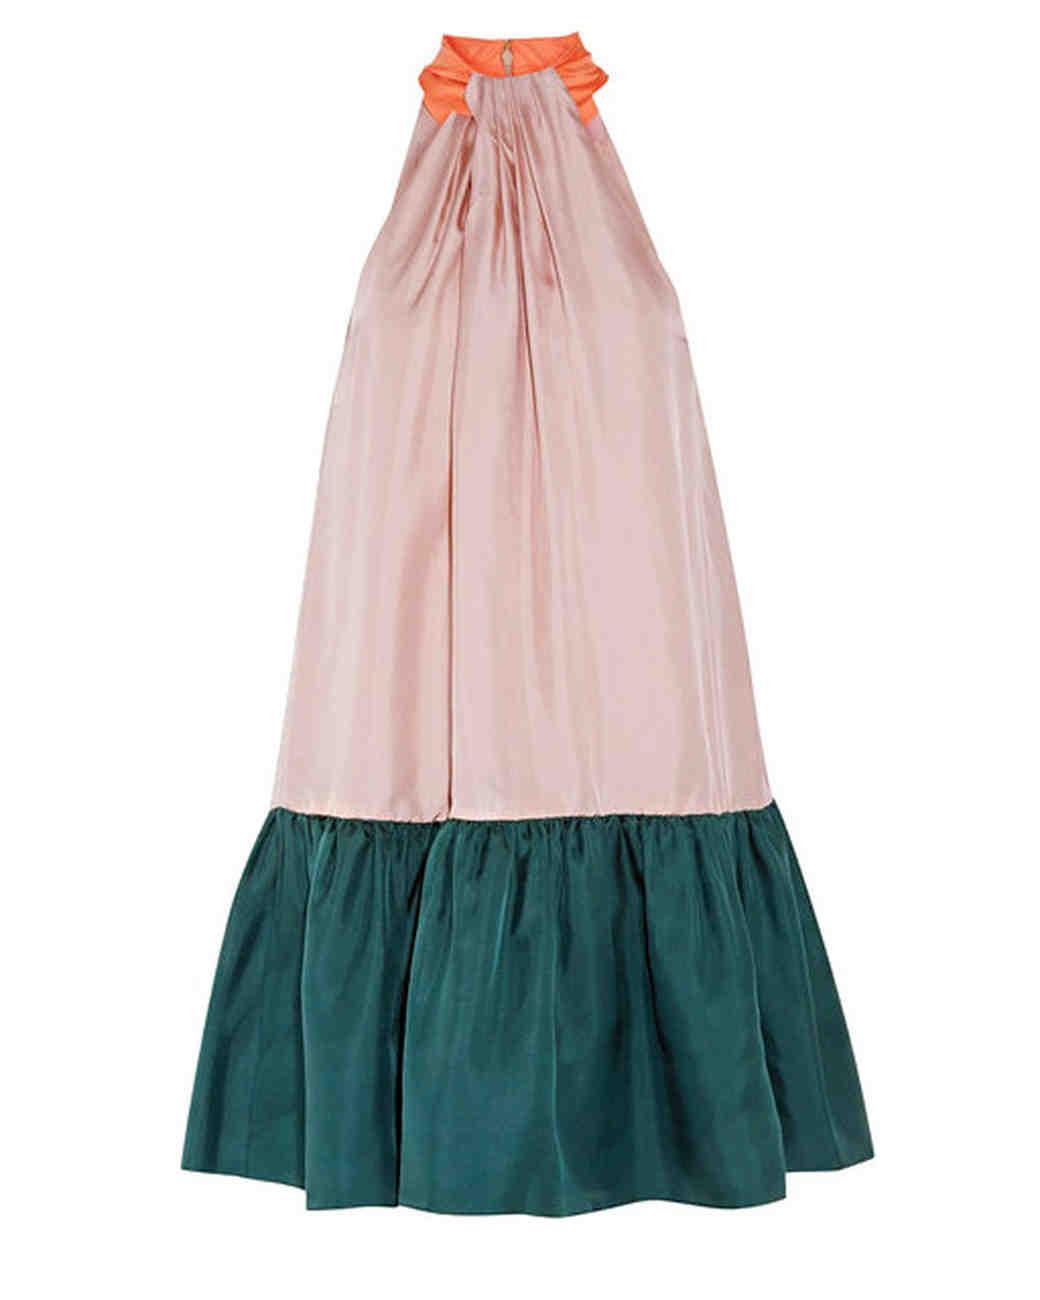 32 Perfect Dresses To Wear As A Wedding Guest This Summer | Martha Stewart  Weddings